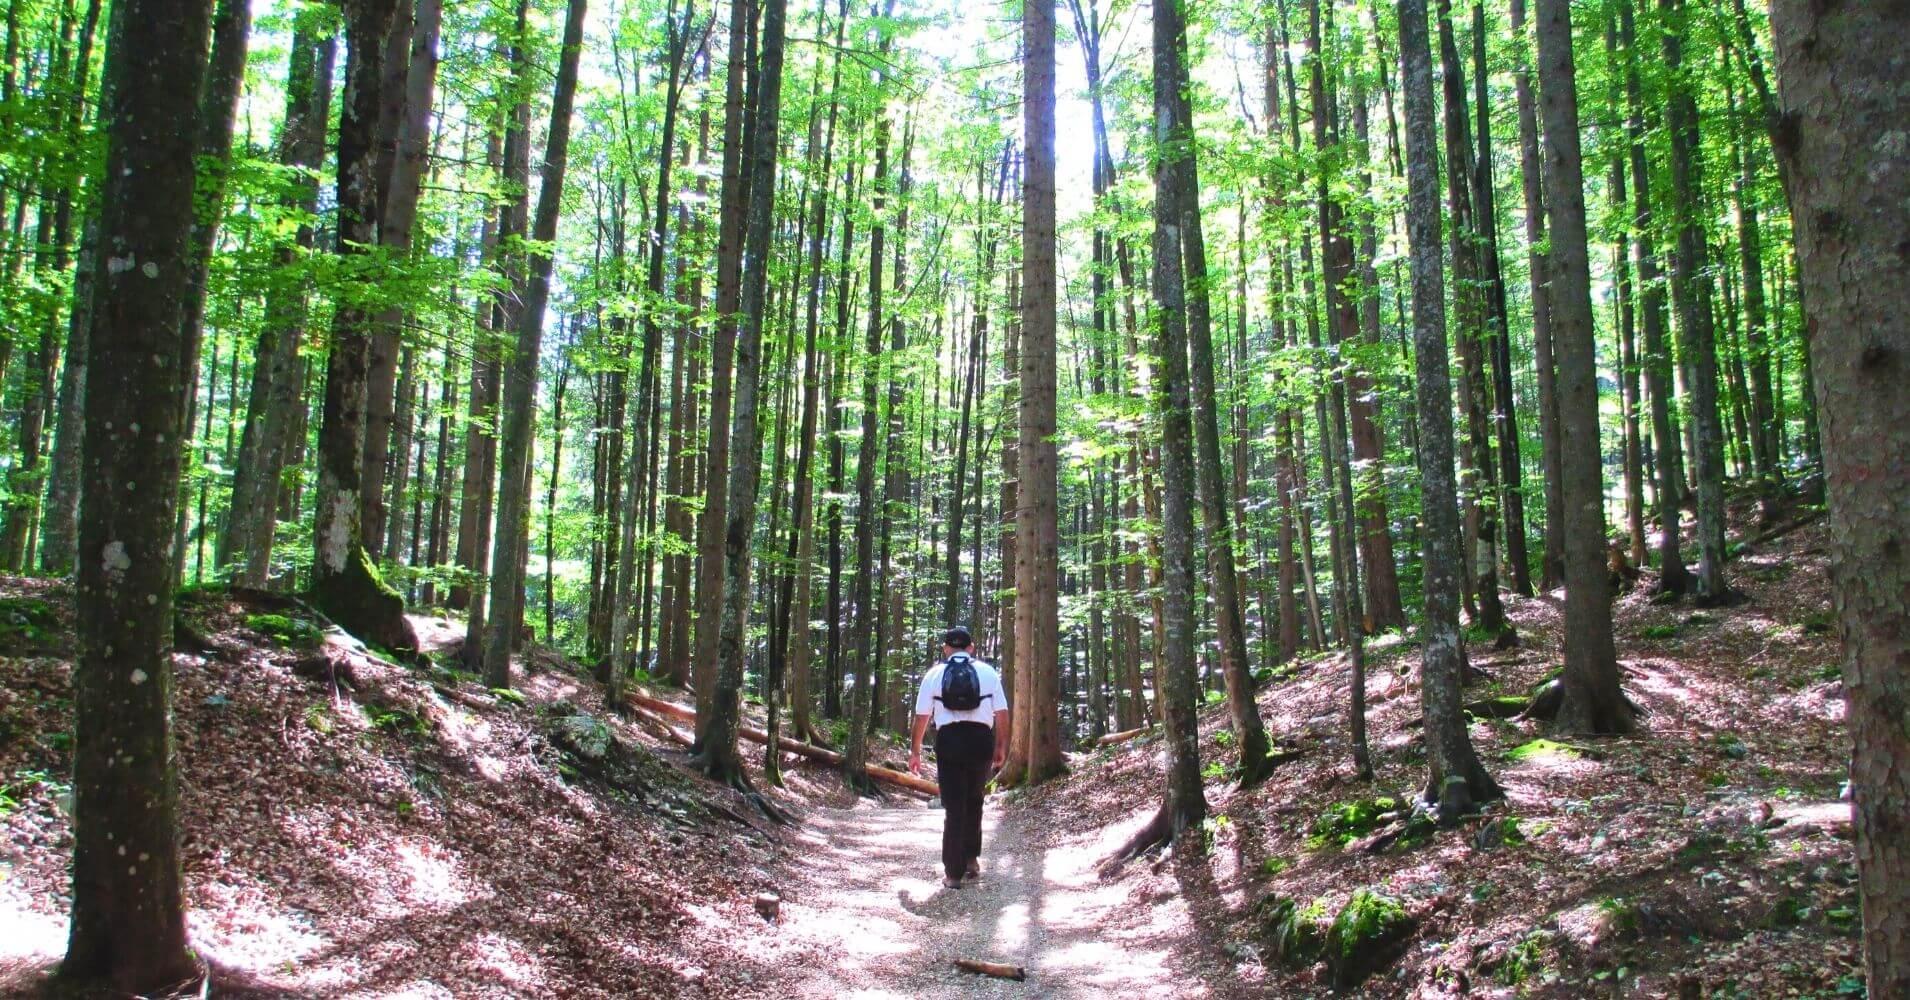 Bosque en las Gorgas de Leutaschklamm. Schanz, Leutasch. Región del Tirol. Austria.